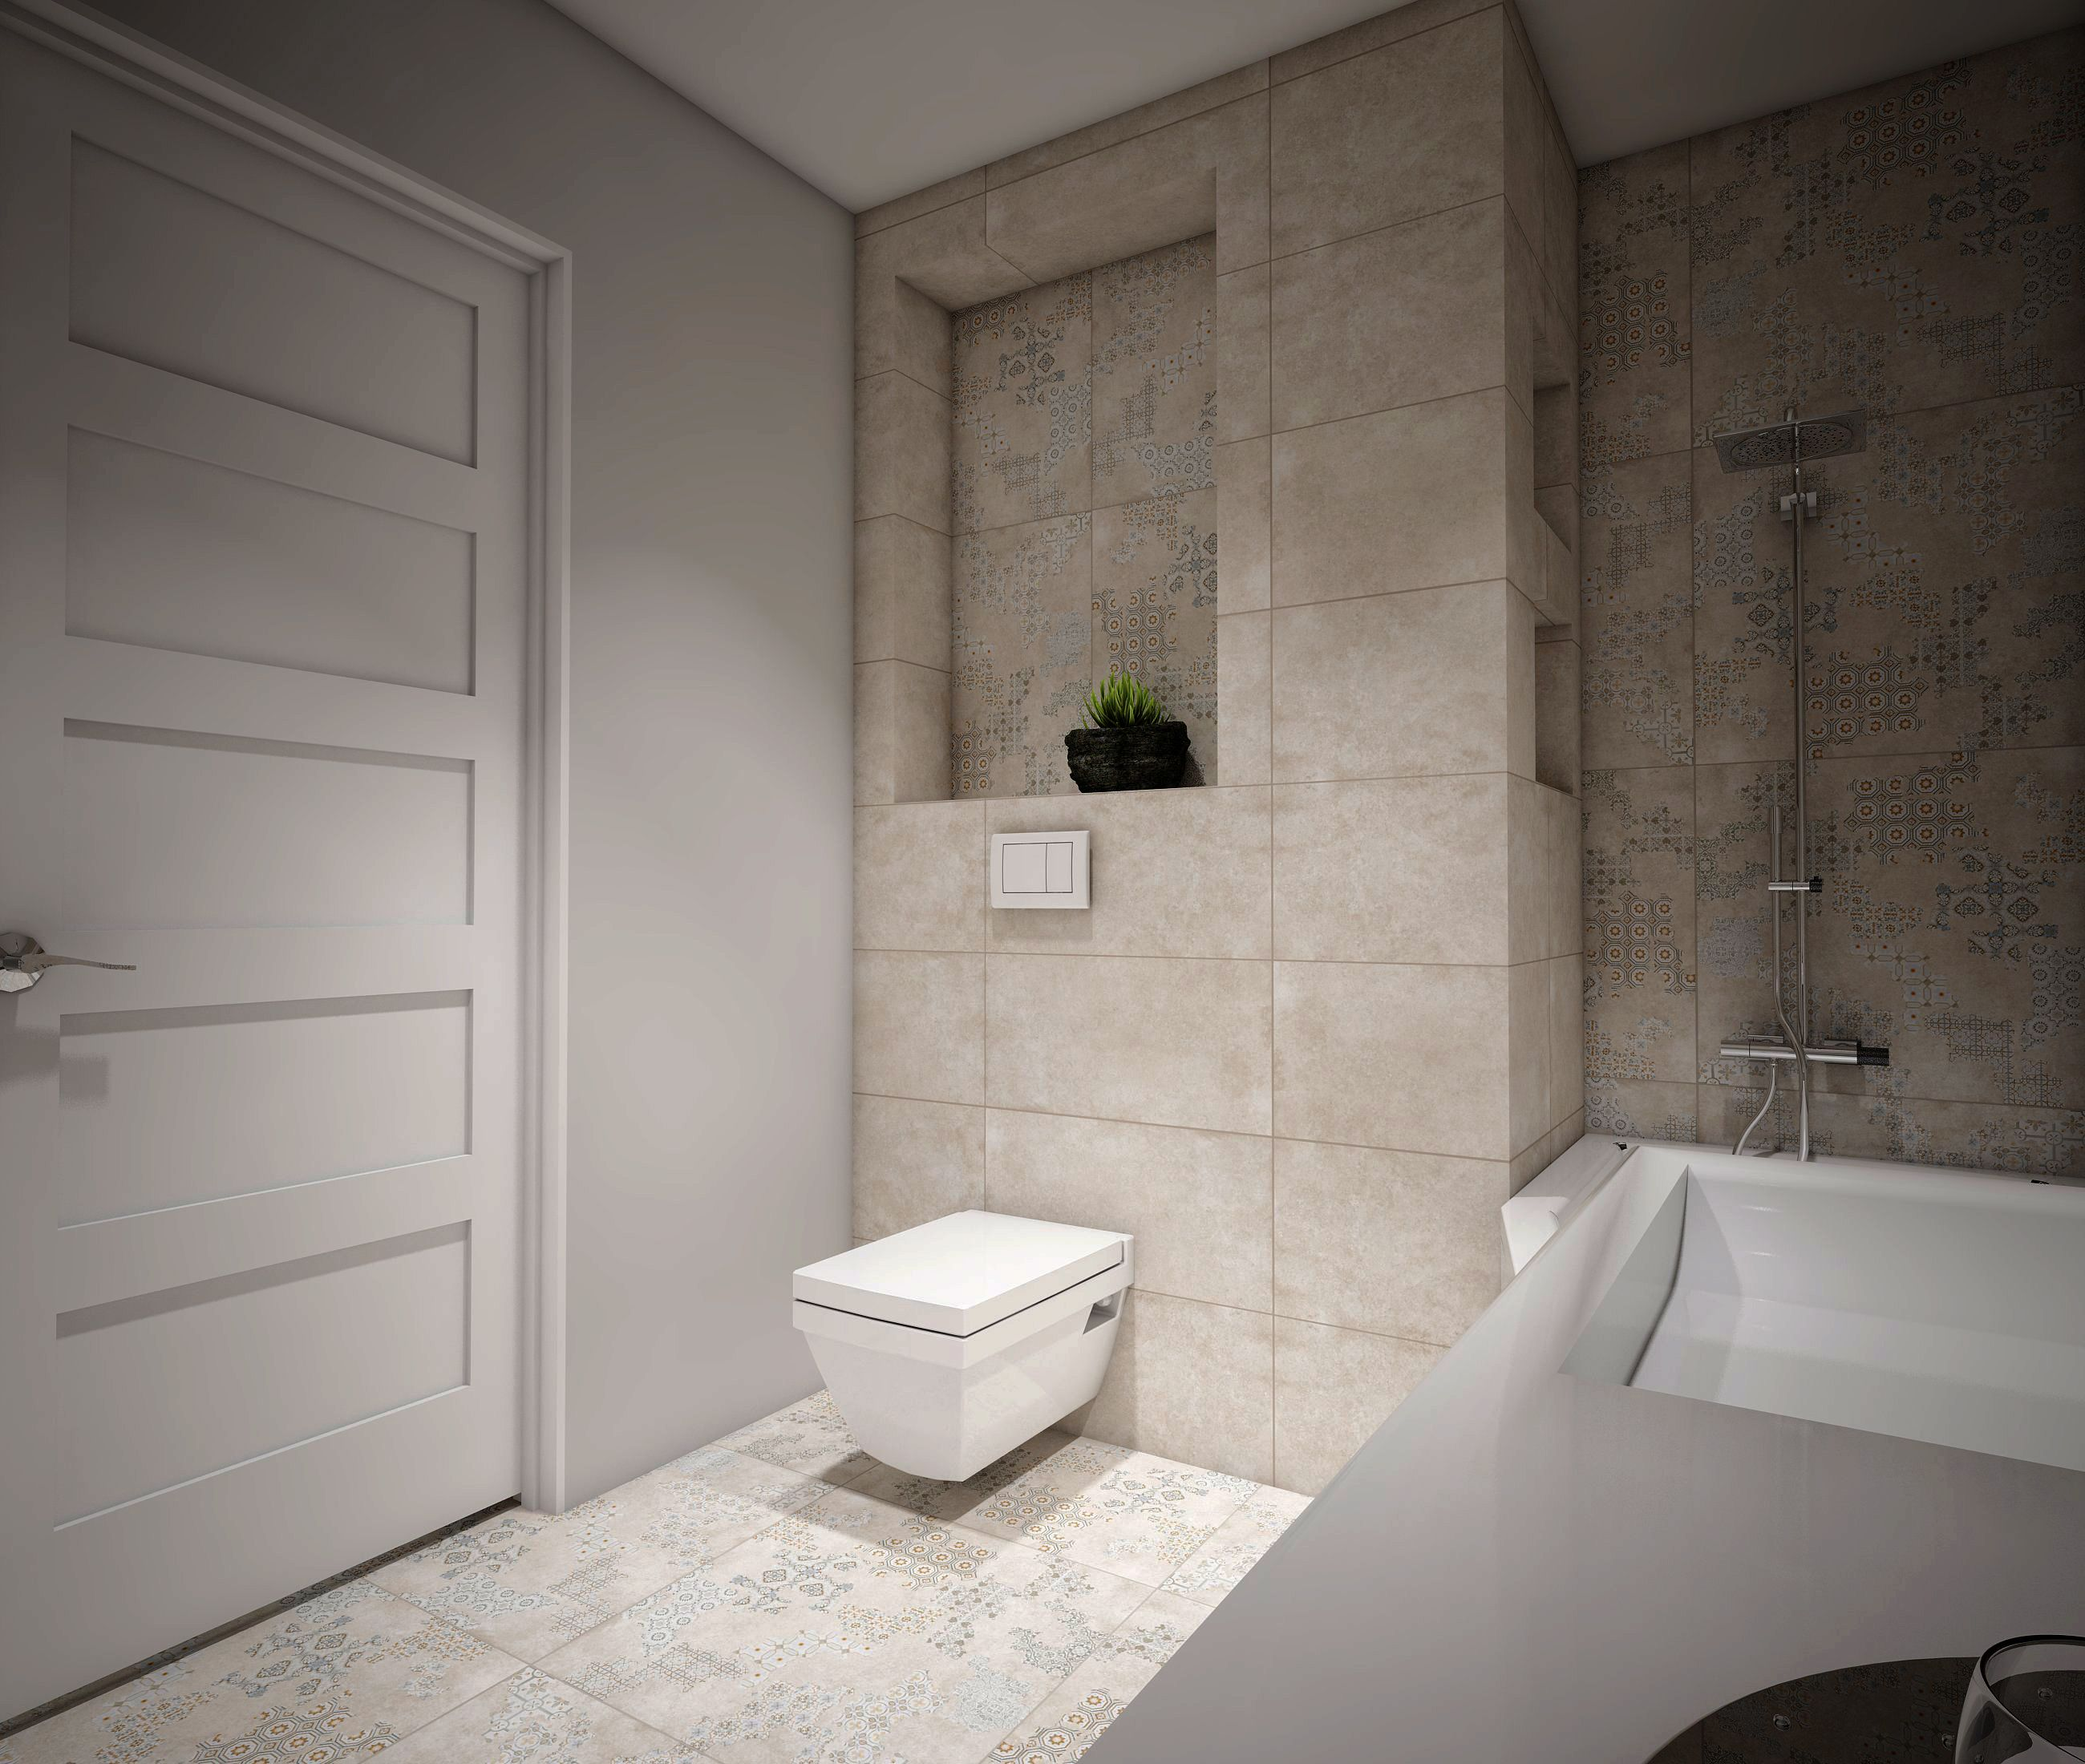 interjeras su cover kolekcija #apdailosnamai #bathroom #interior